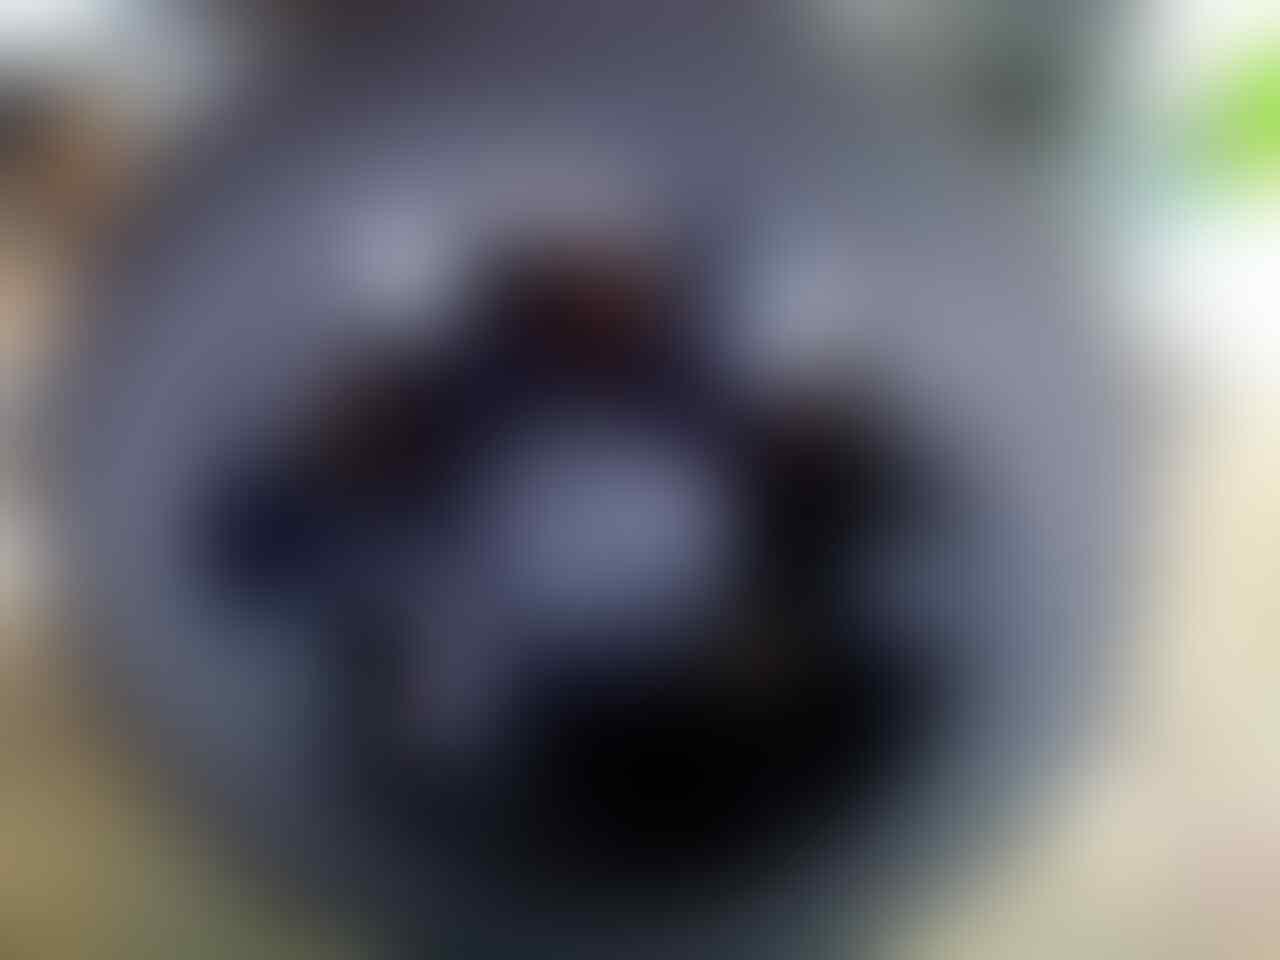 velg 20 ion black plus ban ex Pajero